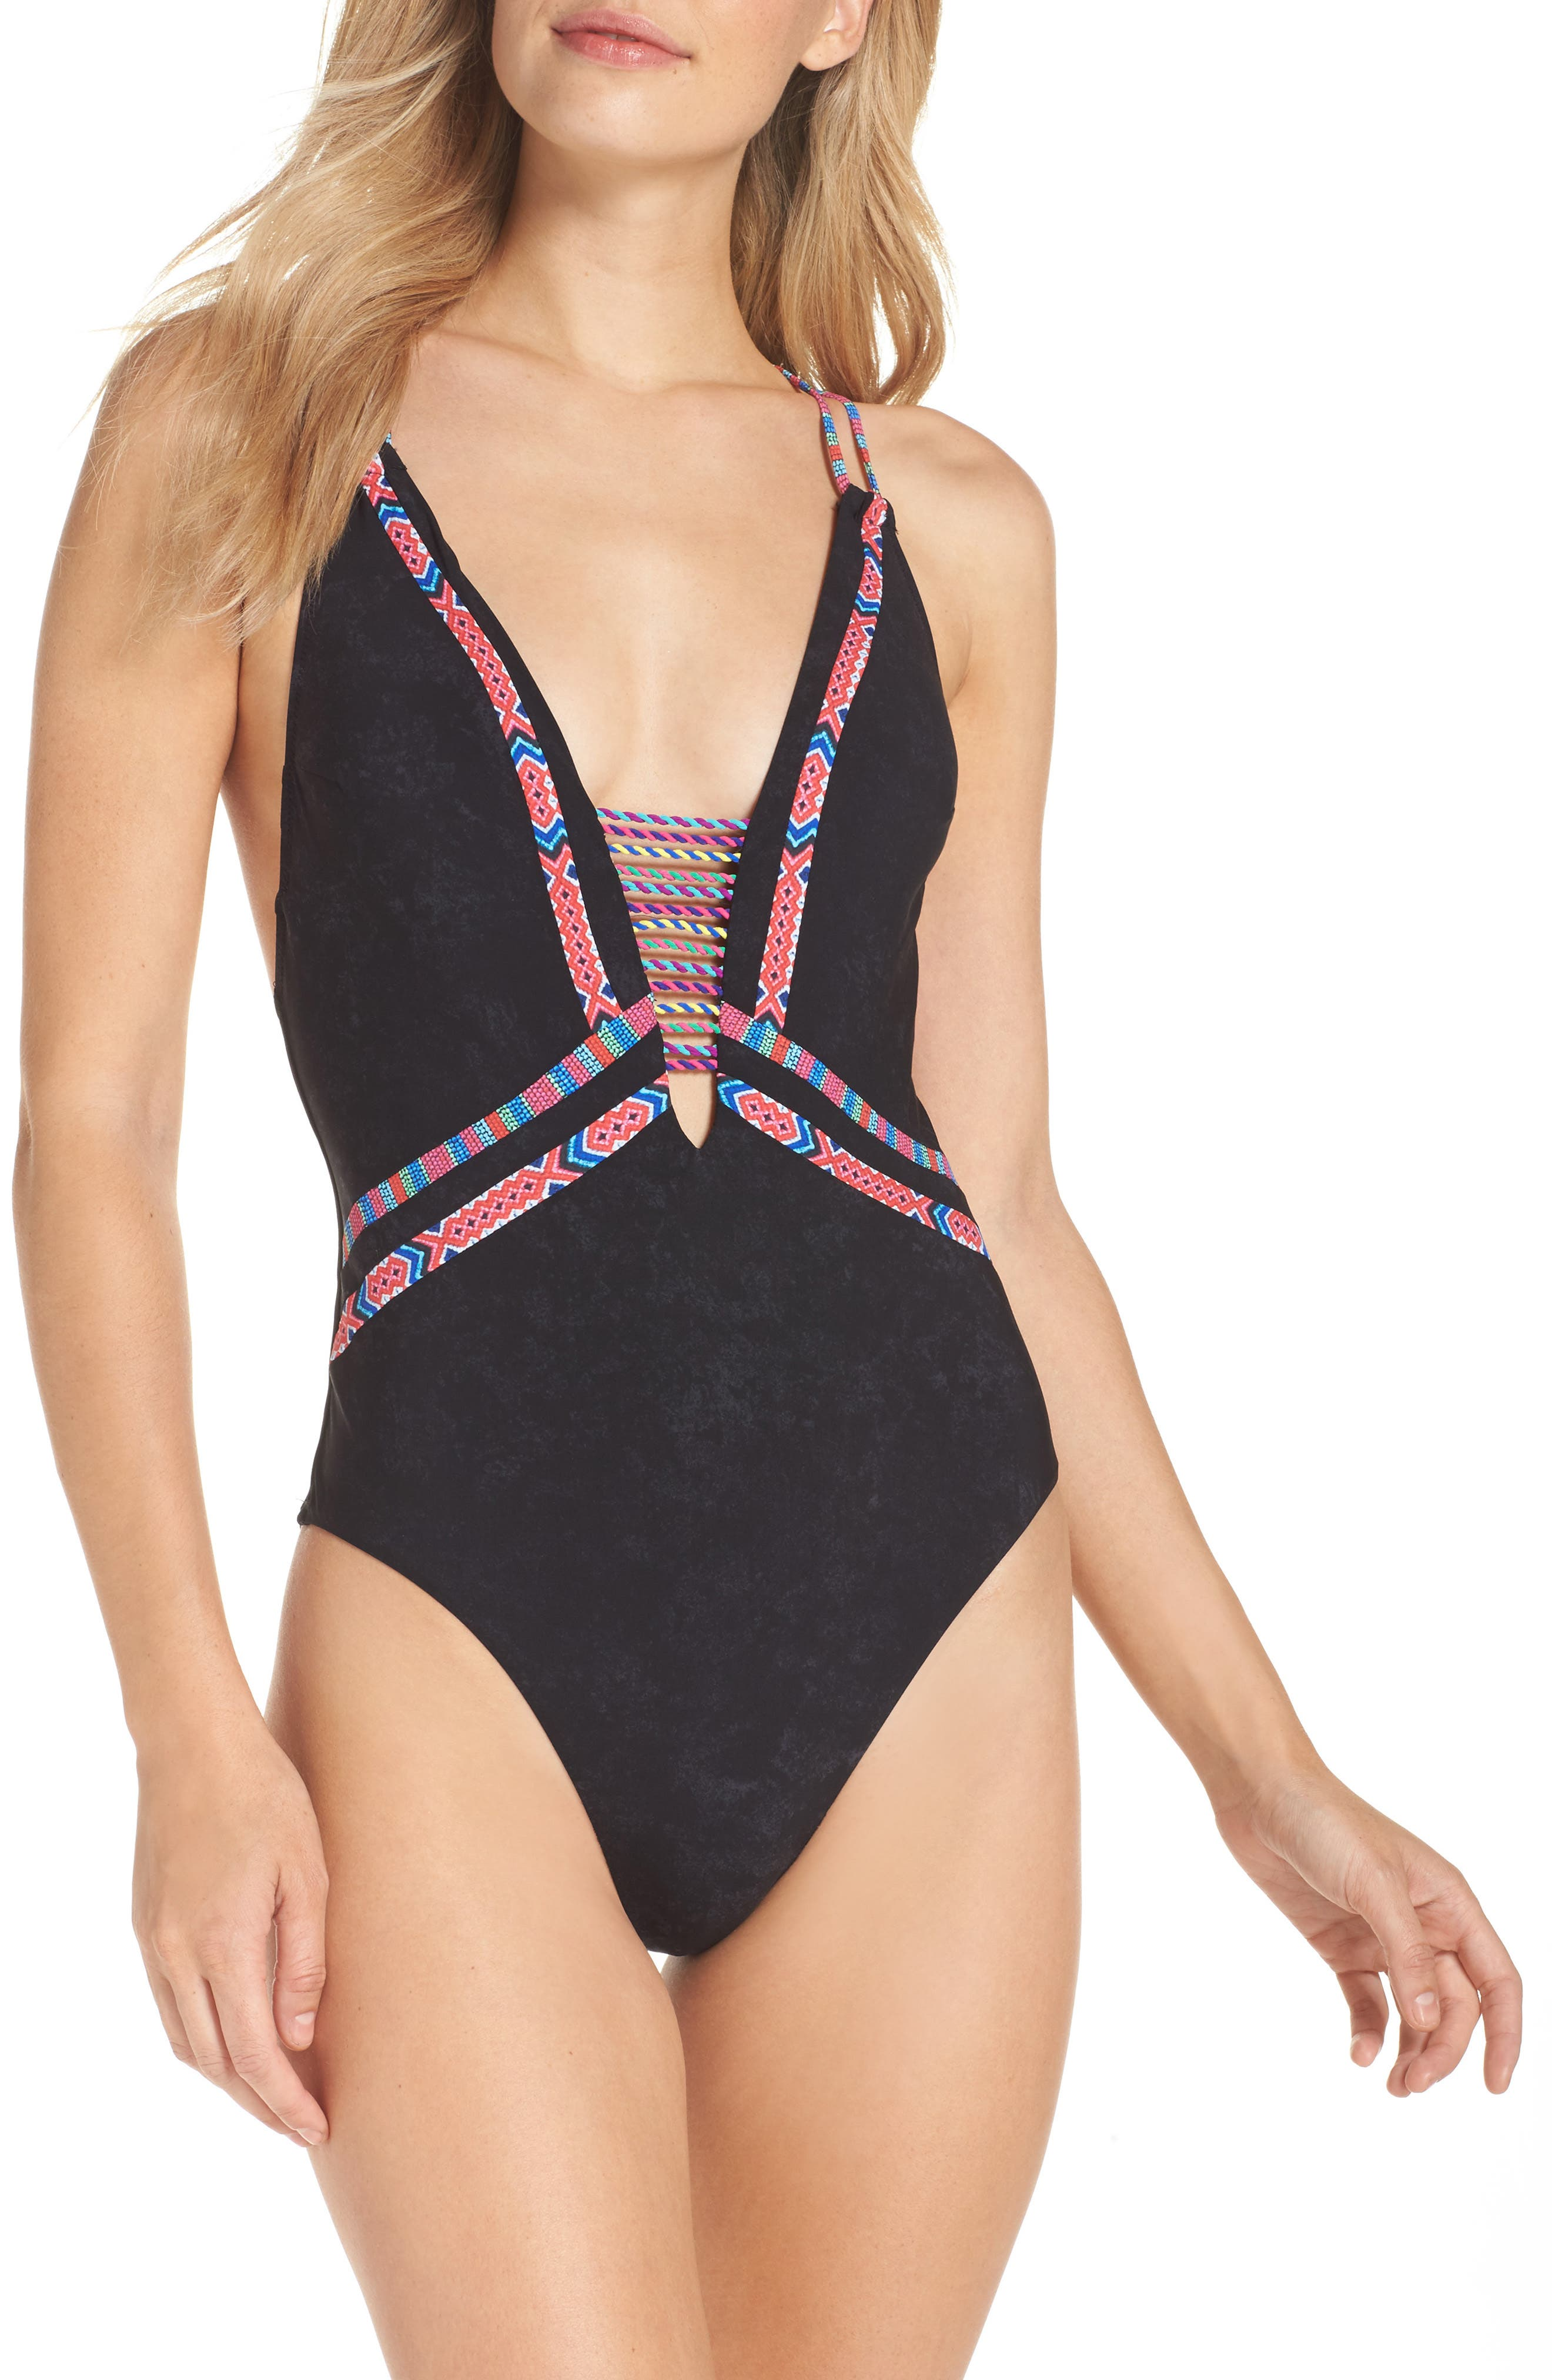 Cha Cha Cha Goddess One-Piece Swimsuit,                             Main thumbnail 1, color,                             Black